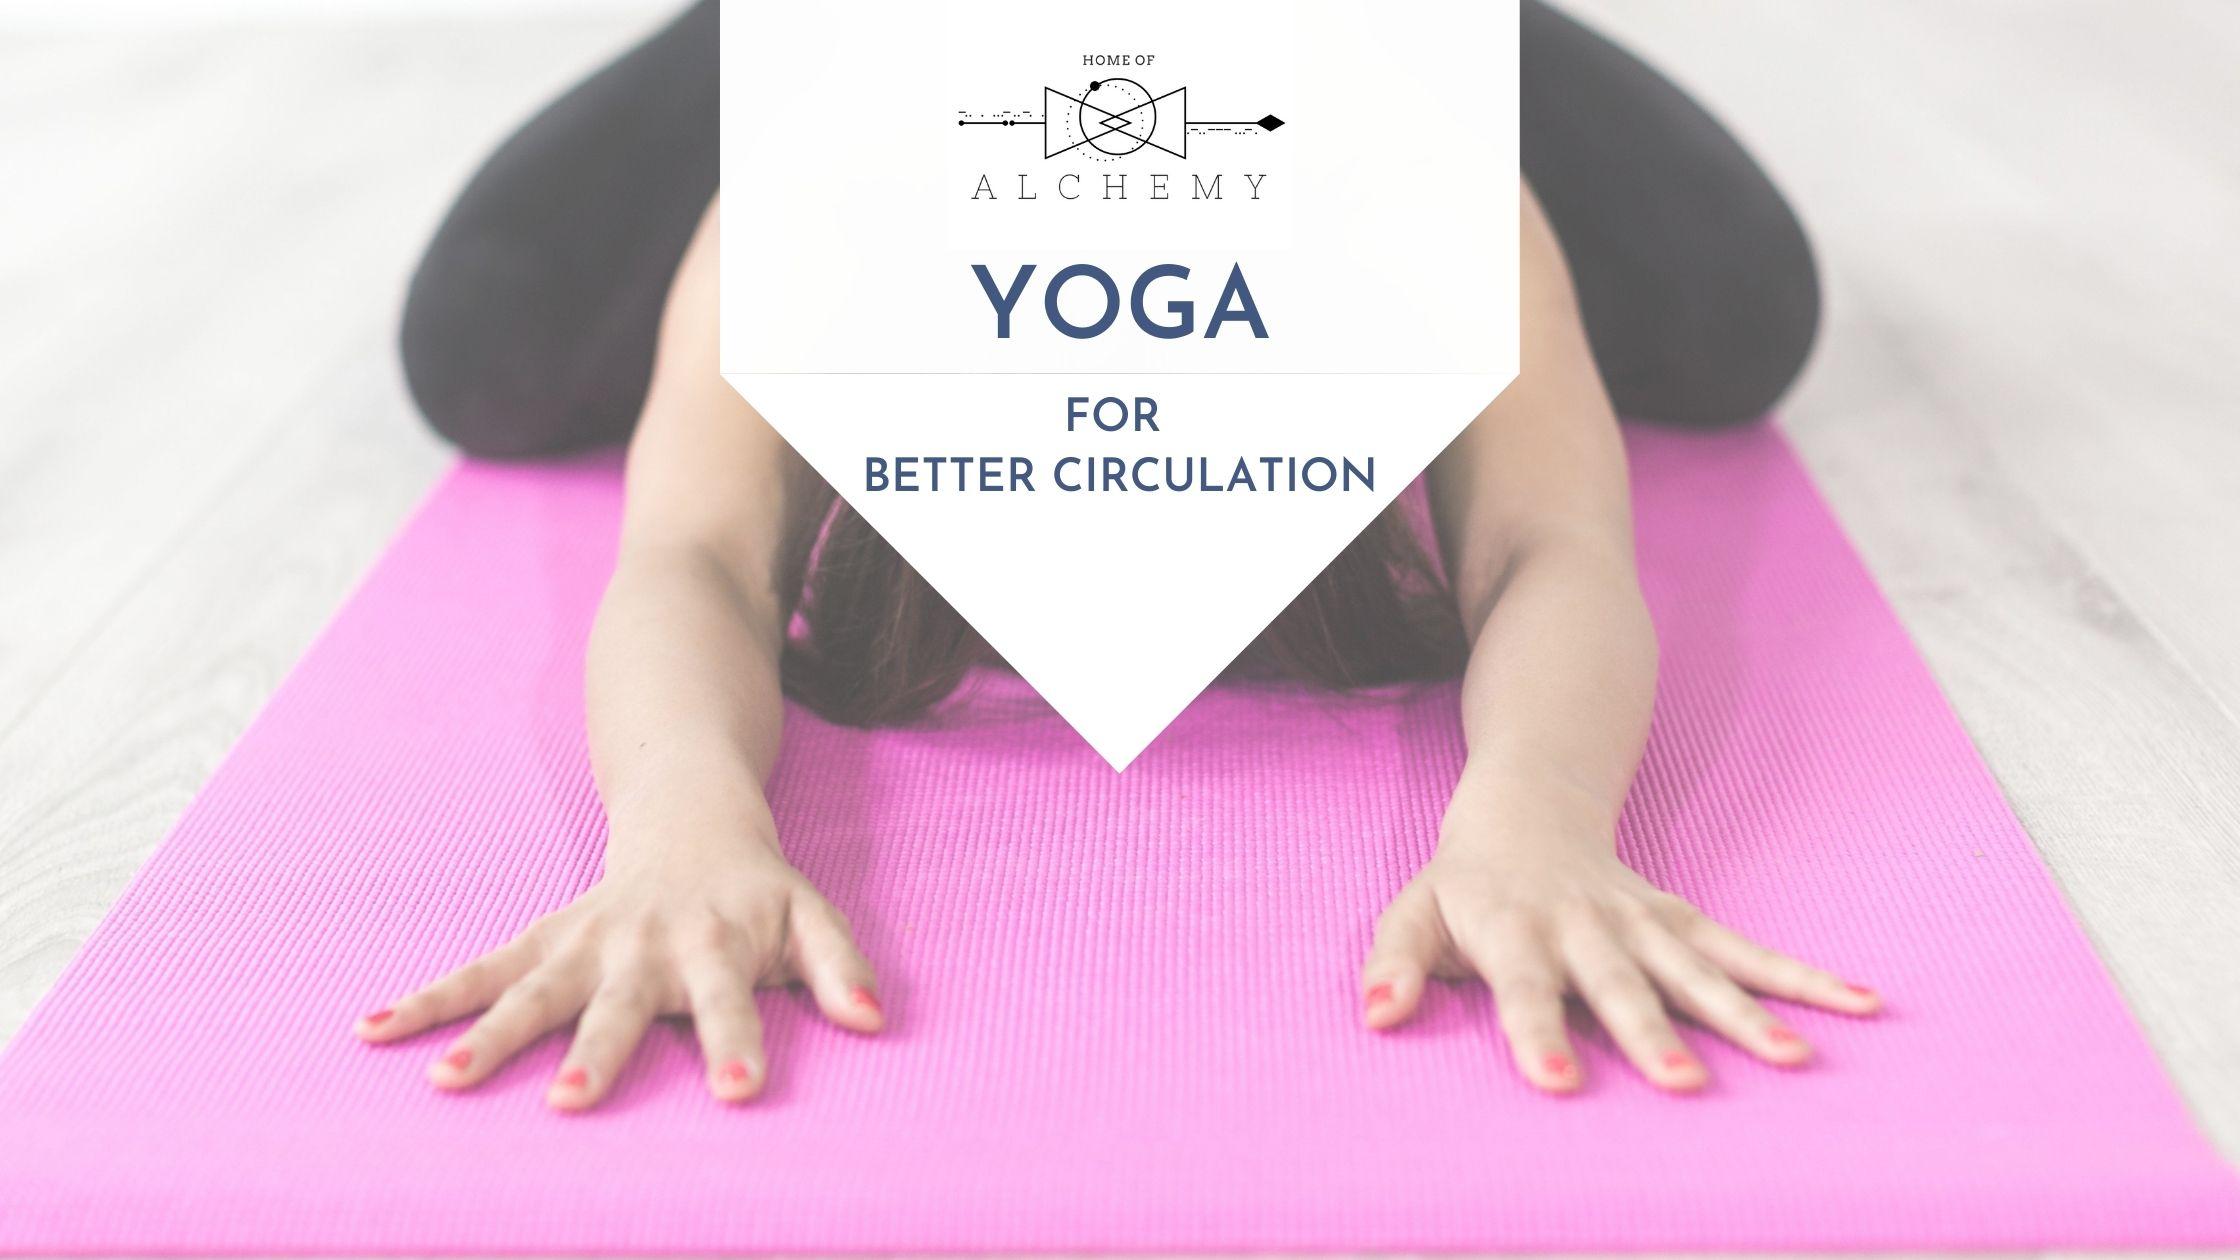 Yoga for better circulation